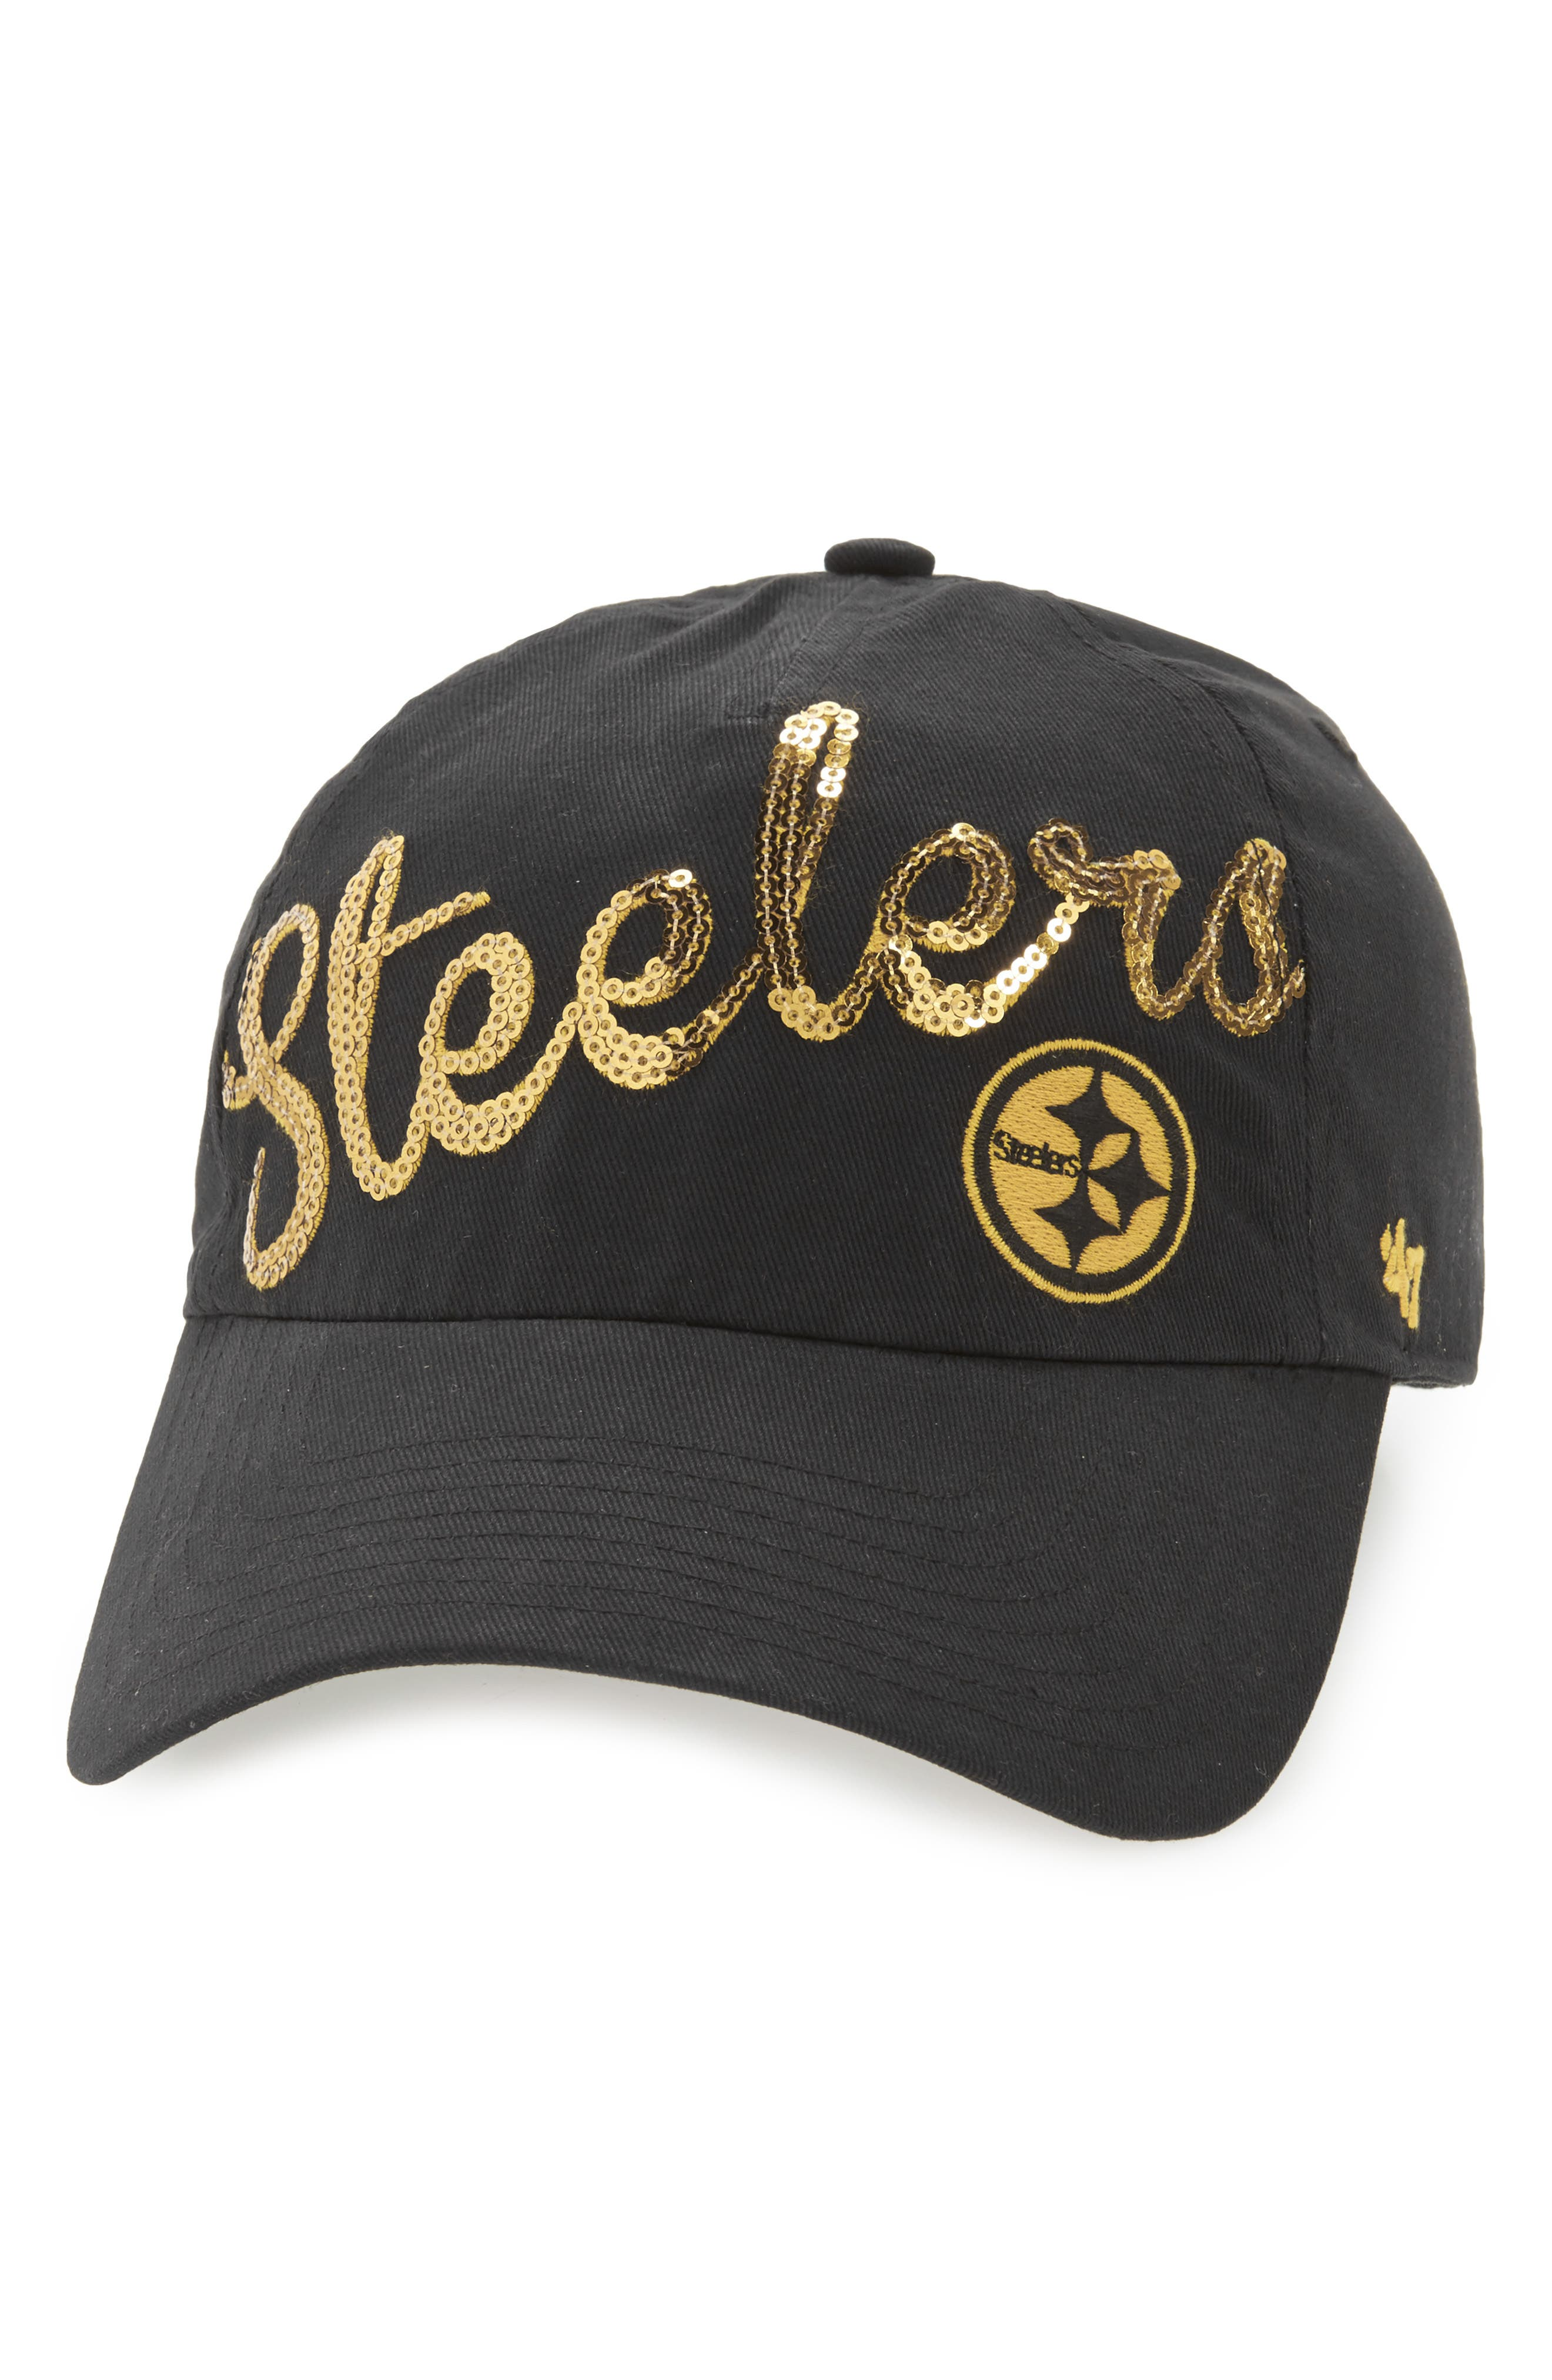 Pittsburgh Steelers Sparkle Cap,                         Main,                         color, Black